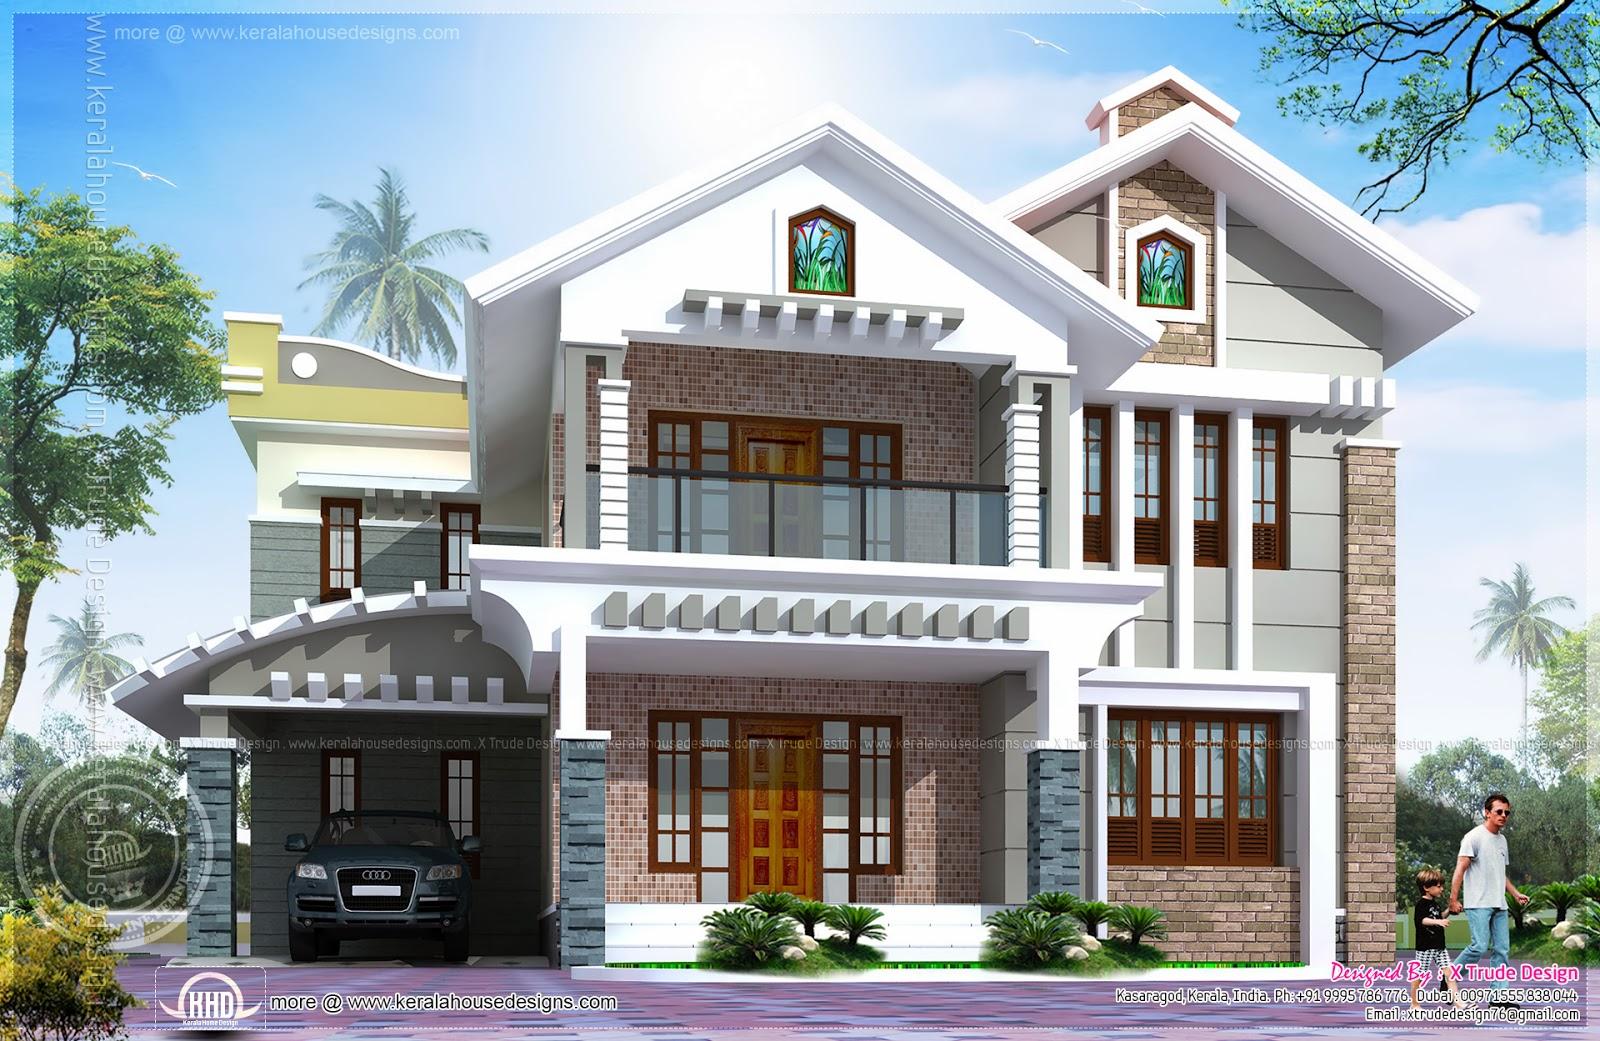 Exterior Villa Design Photo Gallery Exterior Villas Design Uae